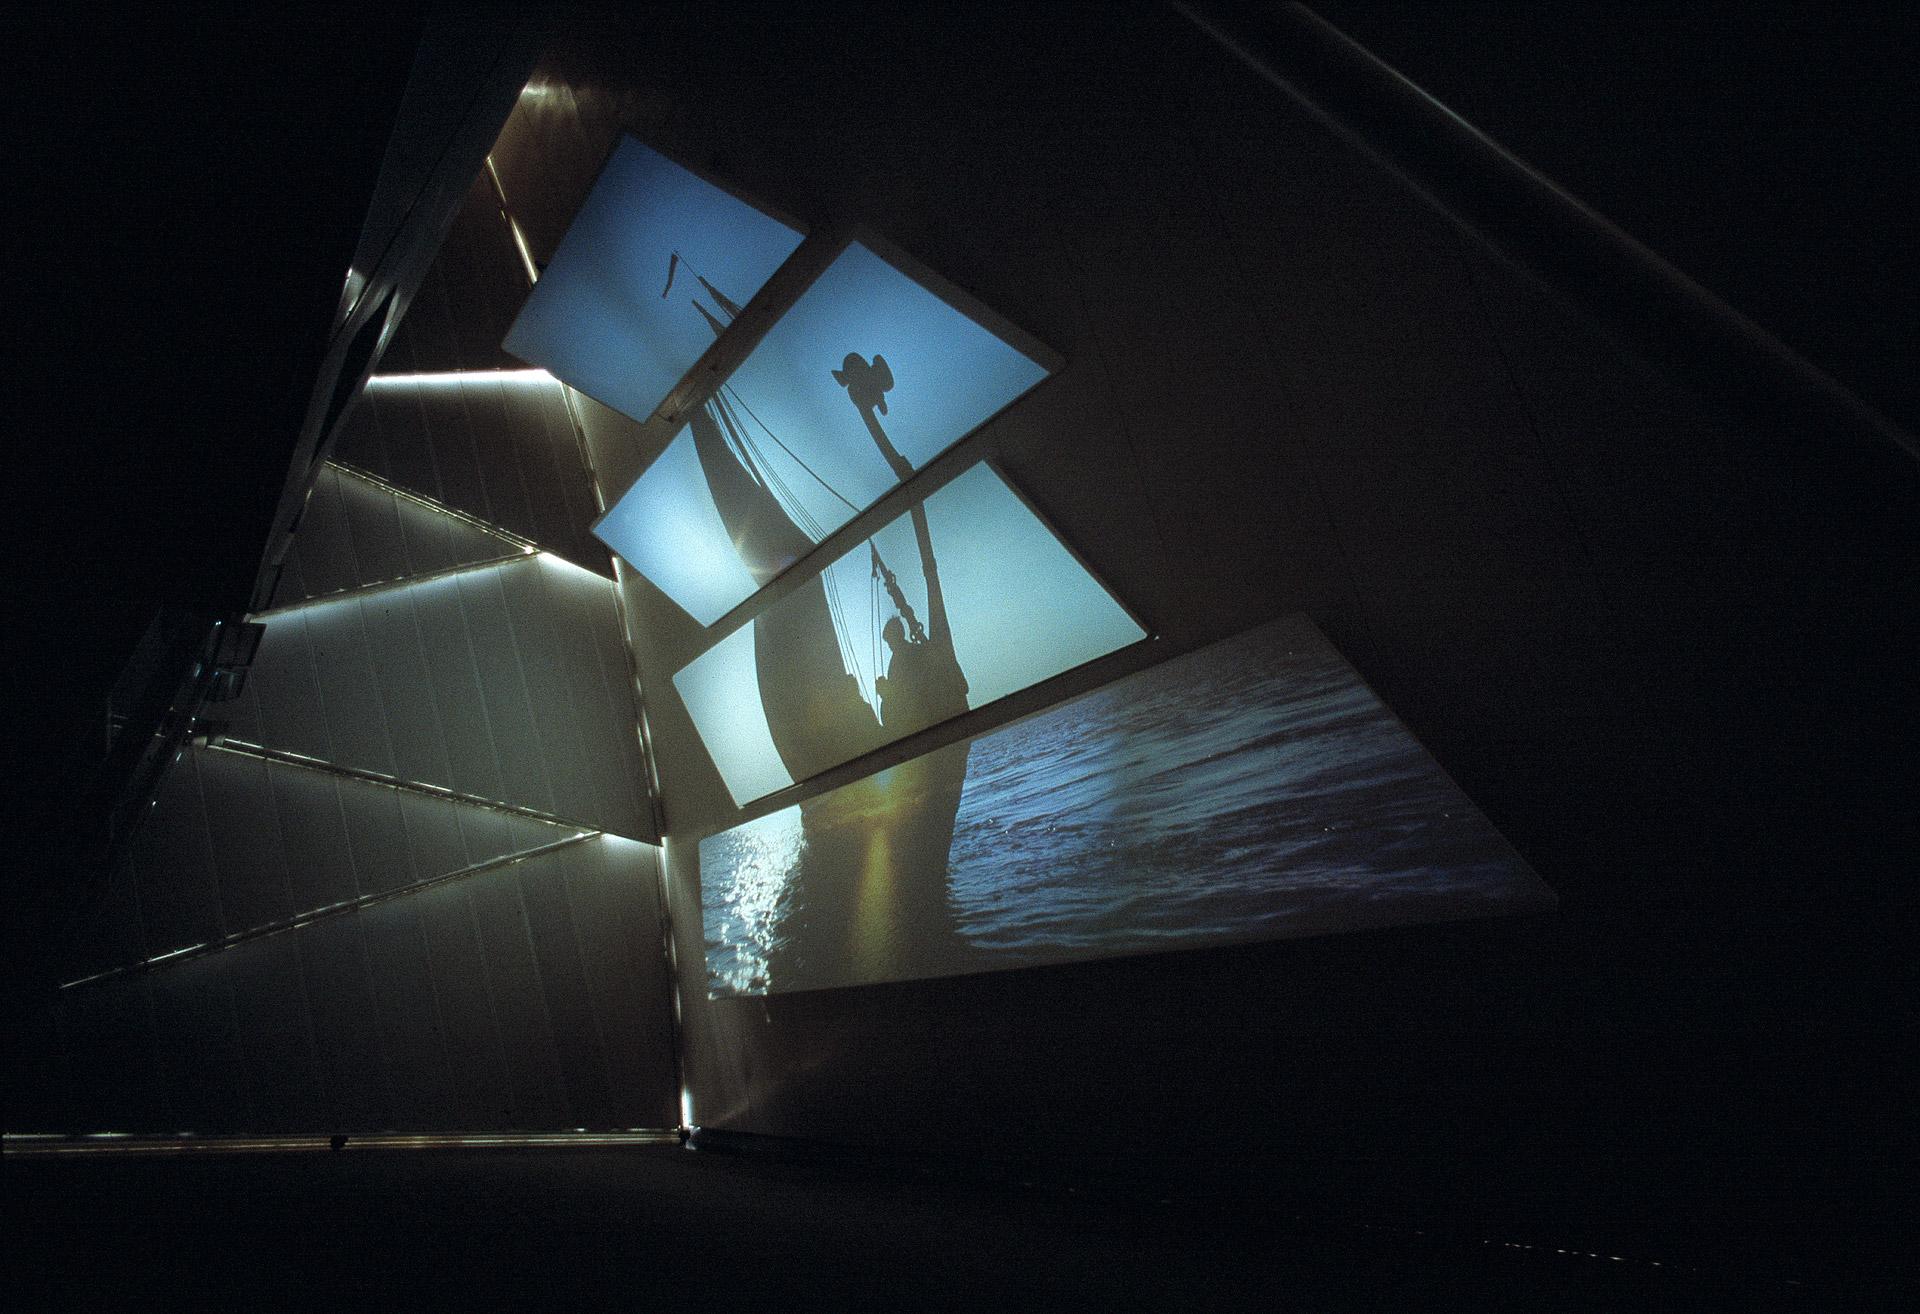 A viking ship multimediashow for the Danish Pavillon in Sevilla